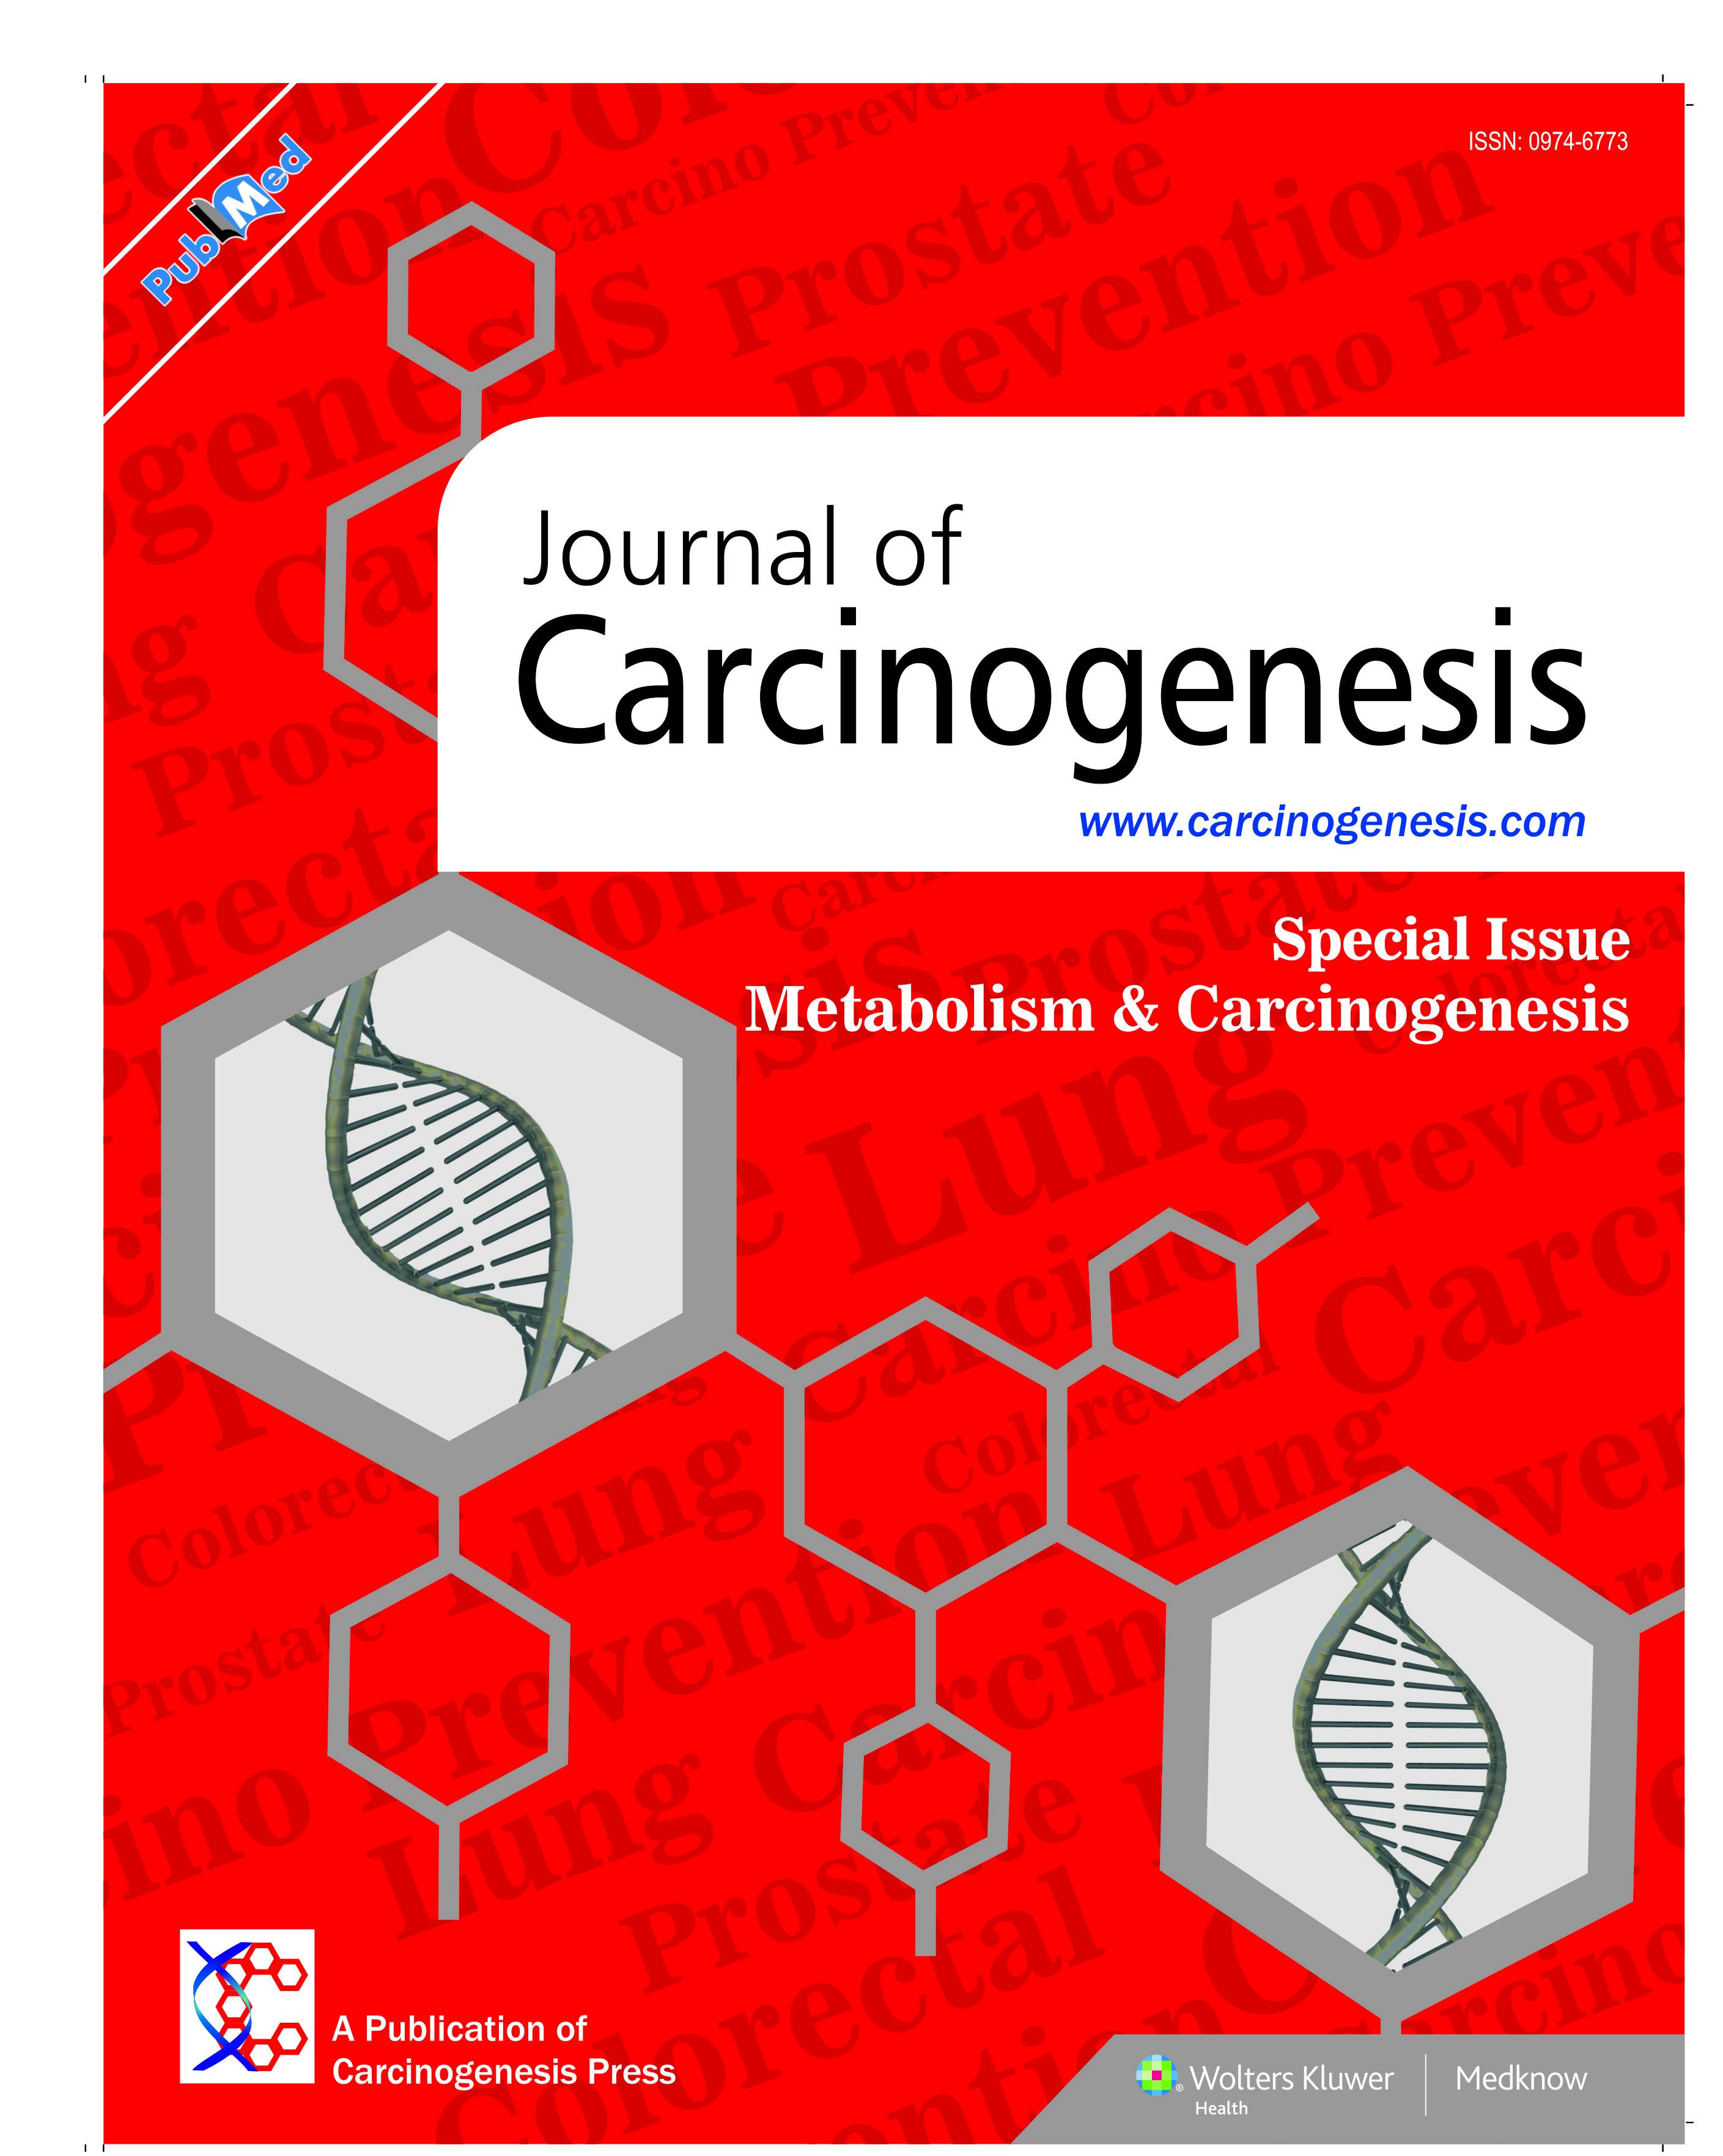 Metabolism and Carcinogenesis